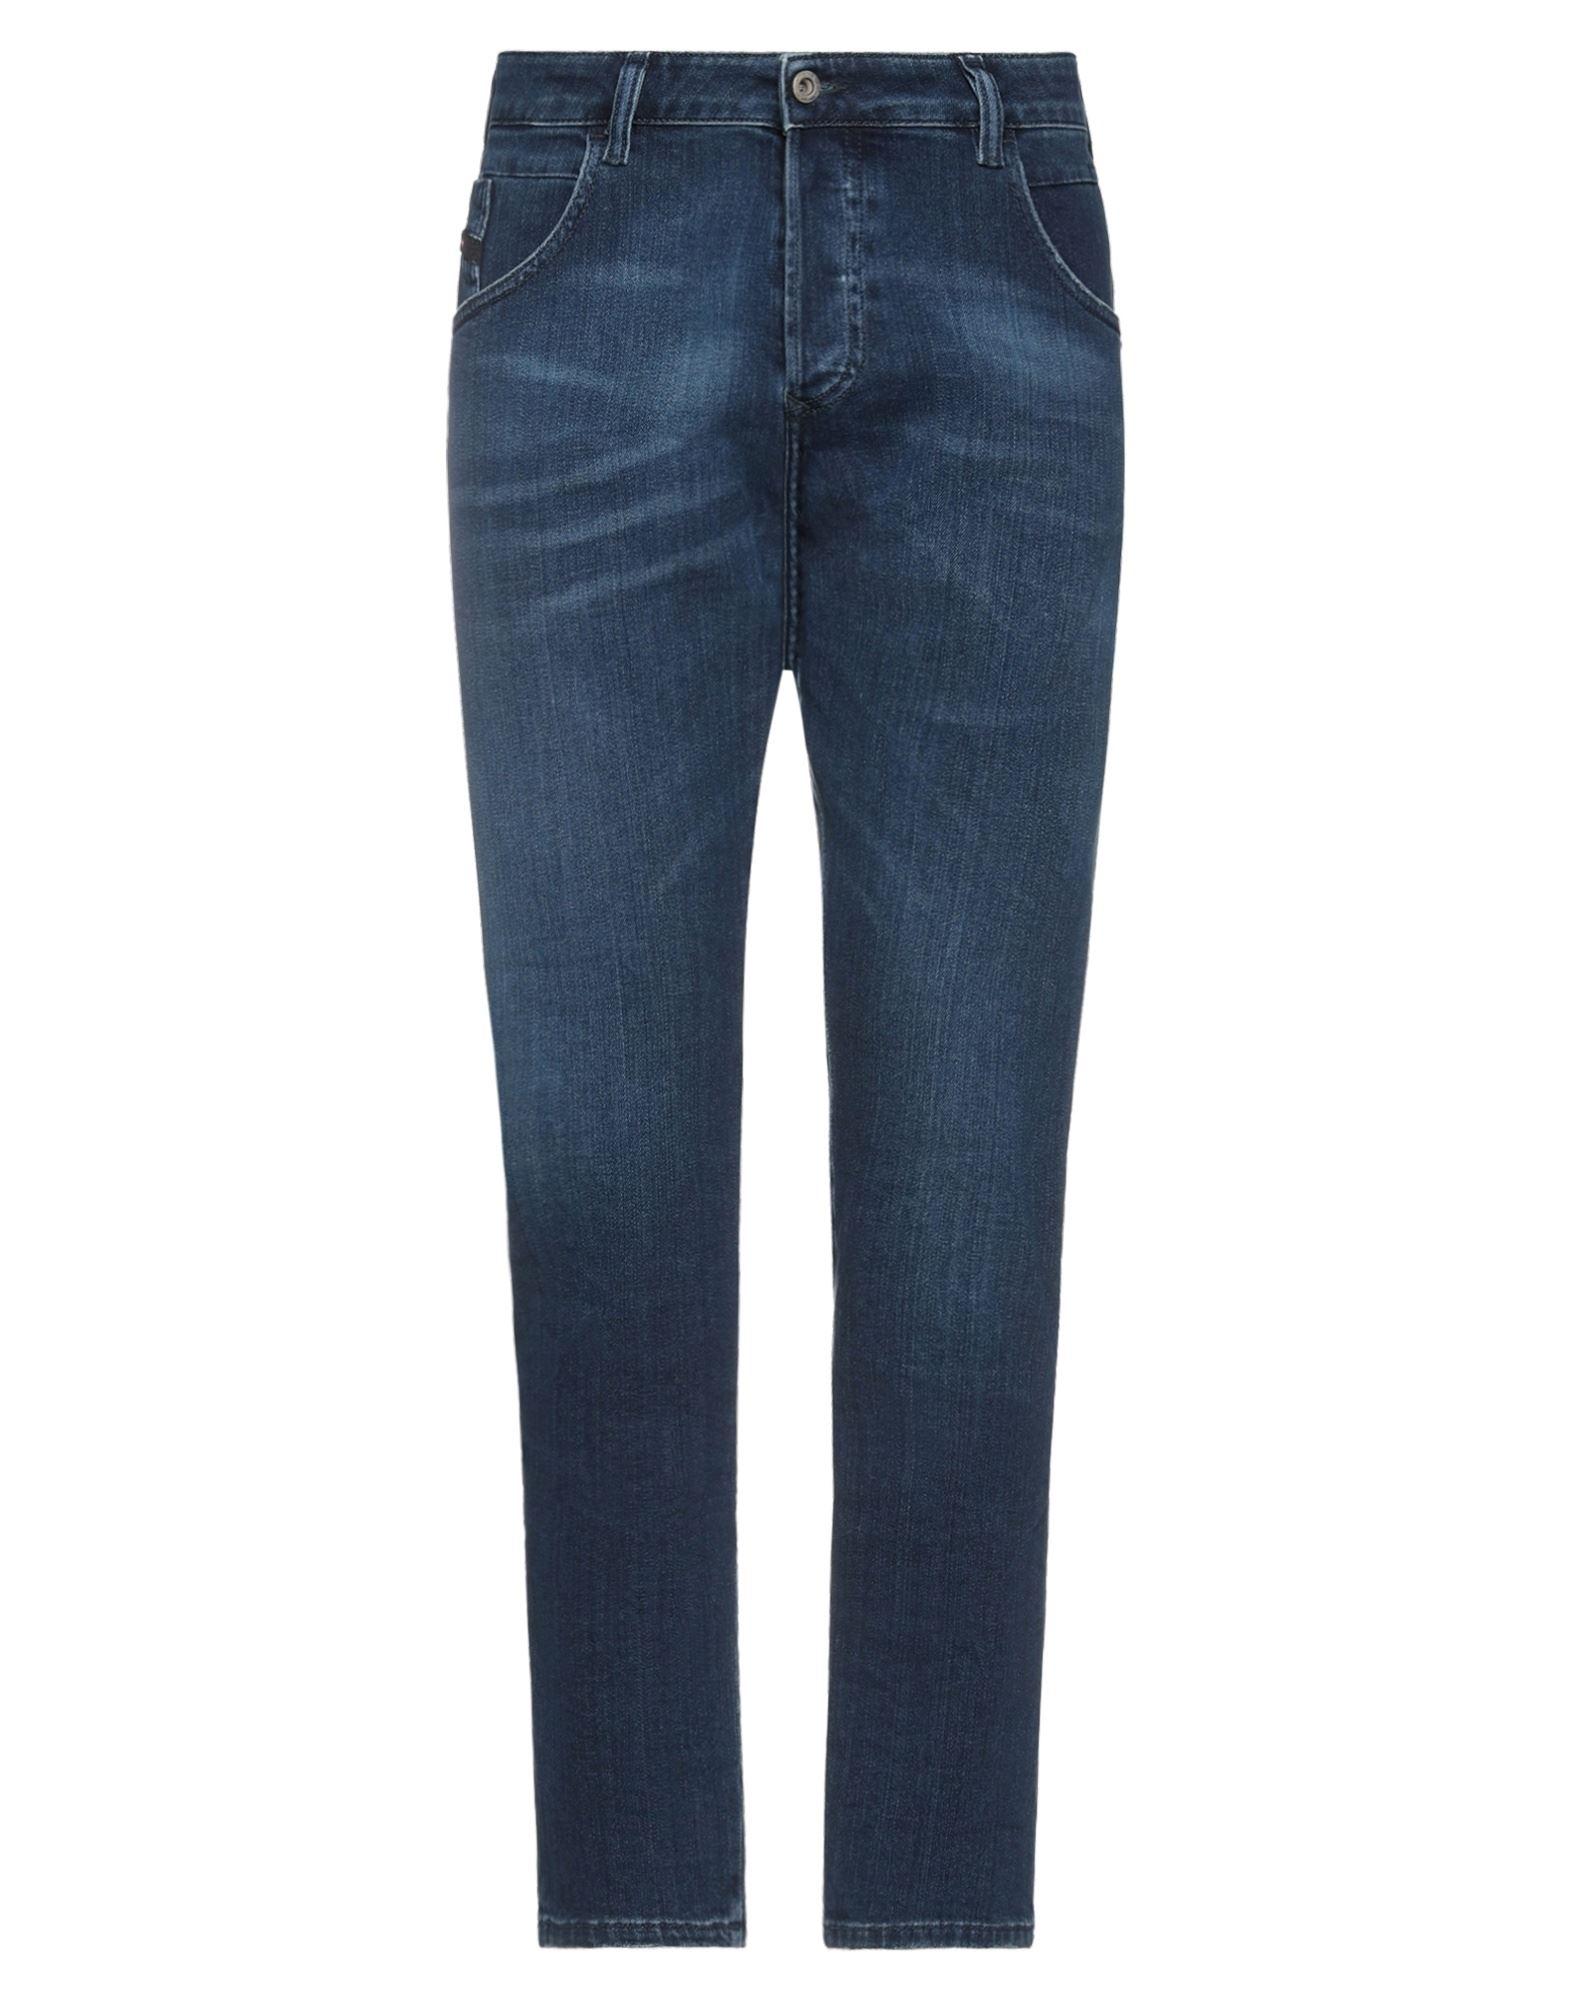 брюки diesel р 36 50 52 ru DIESEL Джинсовые брюки